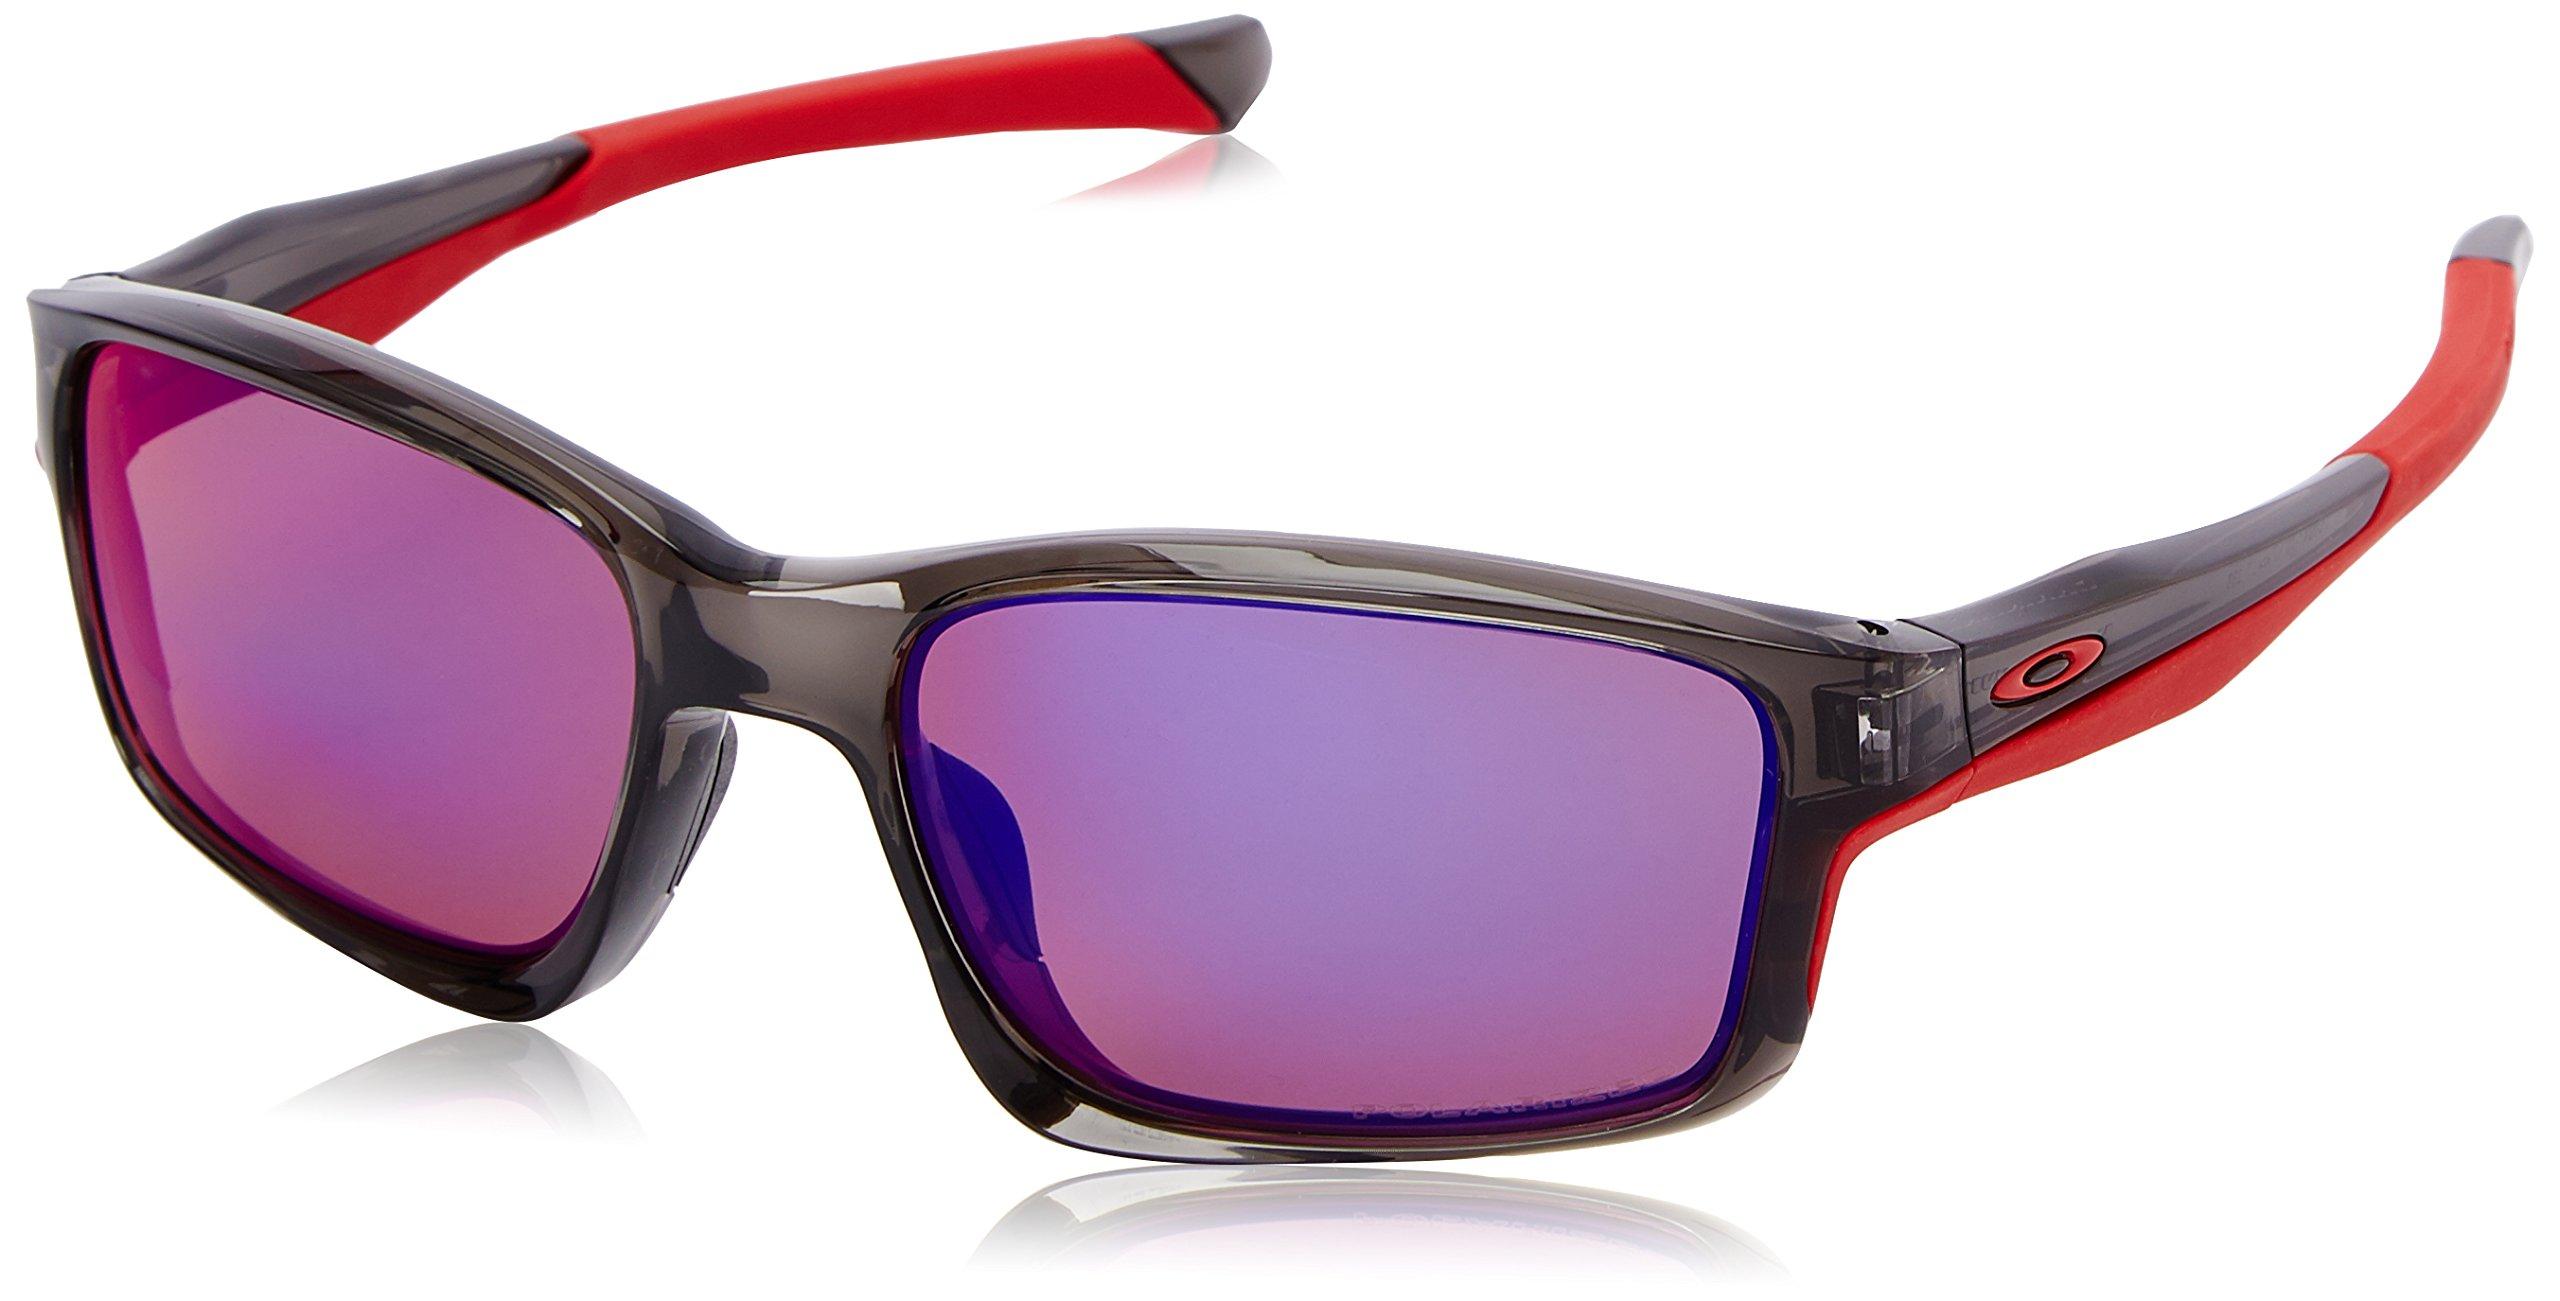 Oakley Mens Chailink OO9247-10 Polarized Ractangular Eyeglasses, Grey Smoke, 57 mm